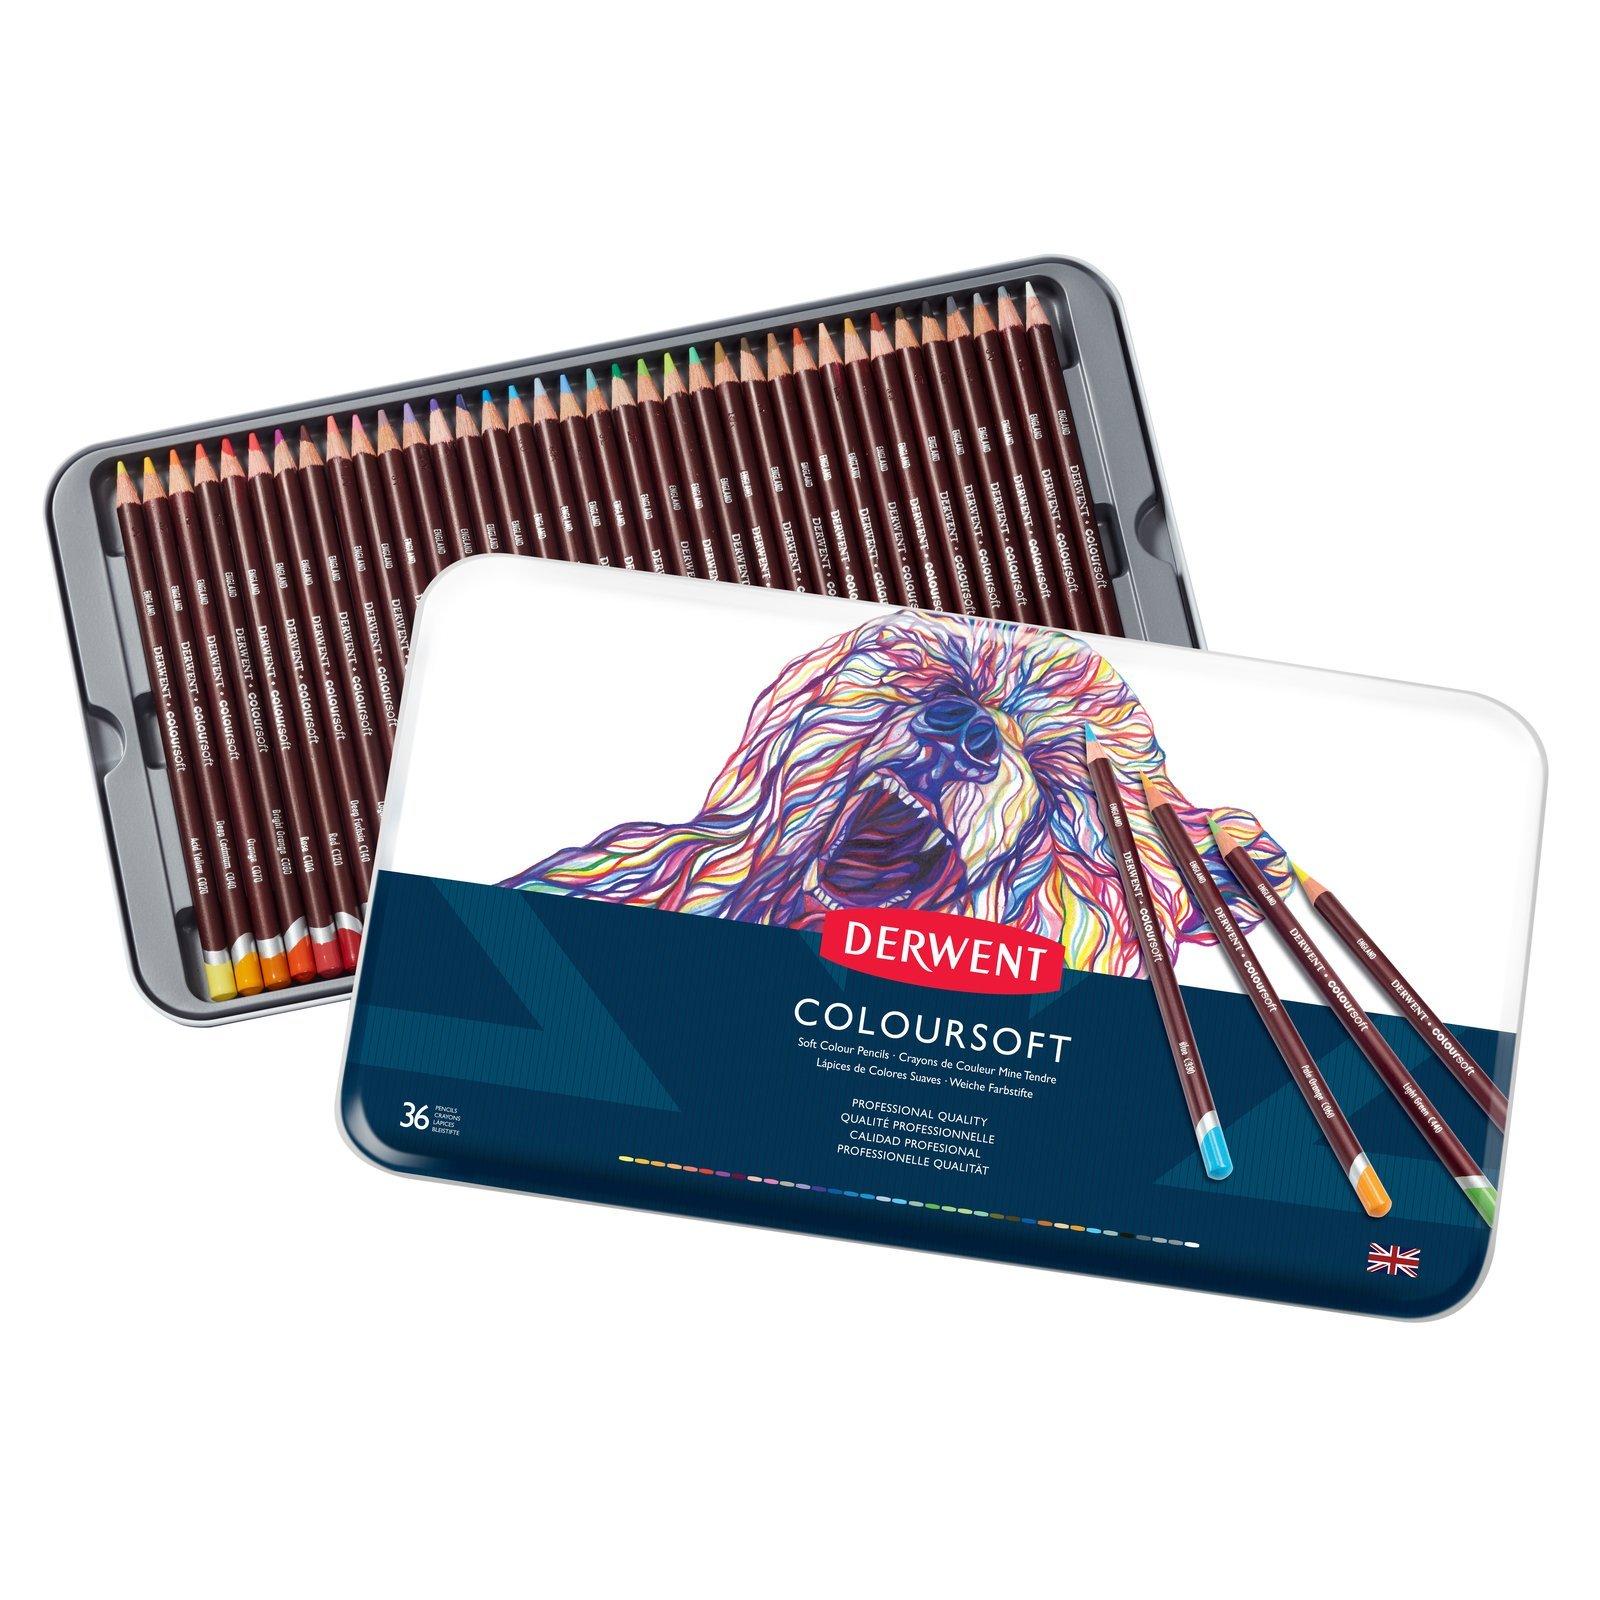 Derwent - Coloursoft Pencils, 36 Tin